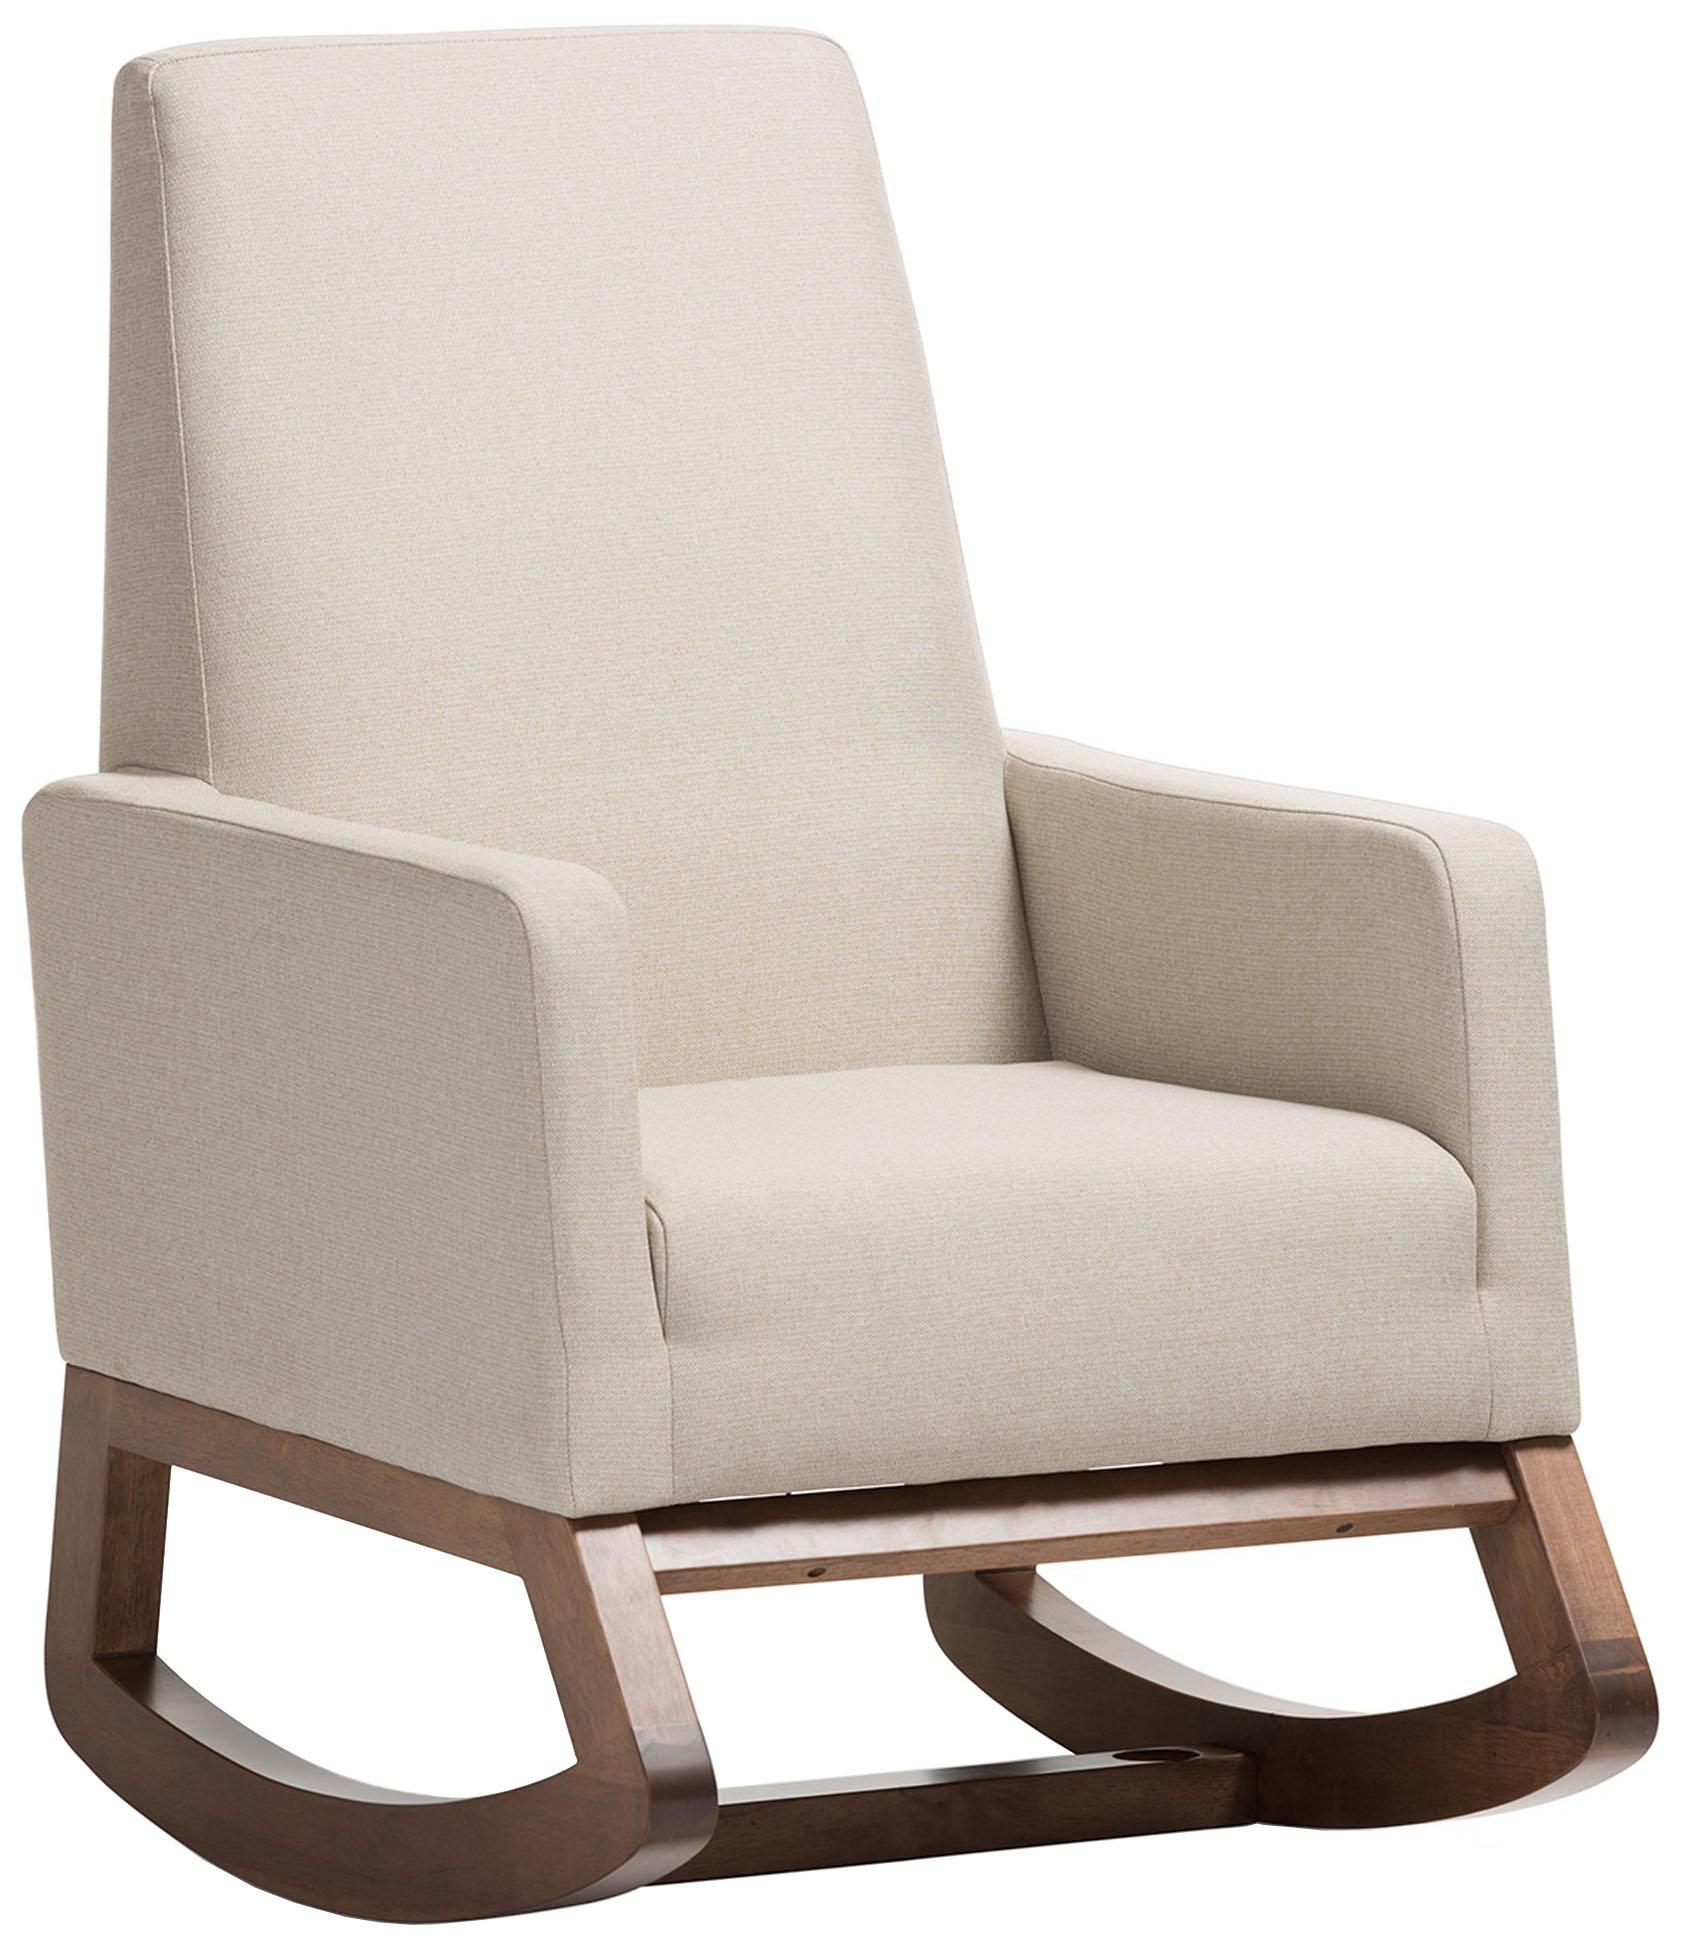 Baxton Studio Yashiya Mid Century Retro Modern Fabric Upholstered Rocking Chair, Light Beige by Baxton Studio